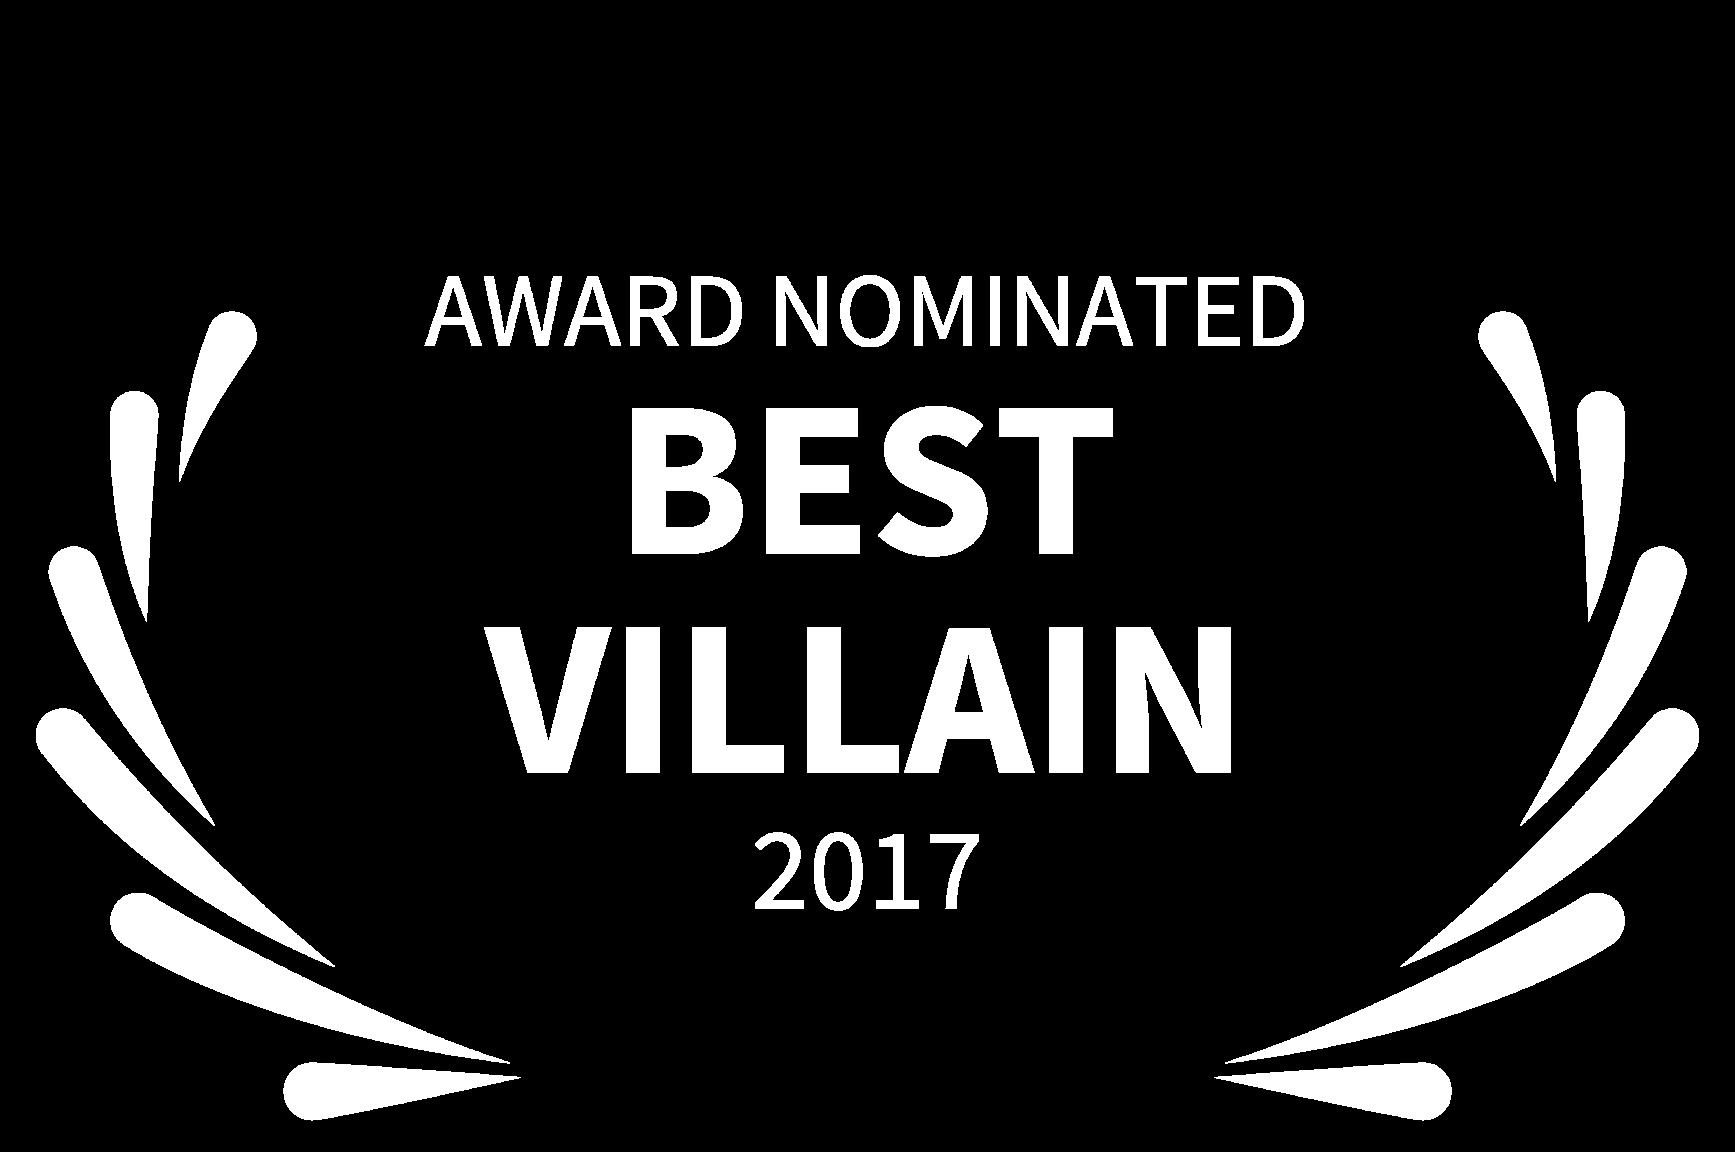 AWARD NOMINATED - BEST VILLAIN - 2017.png